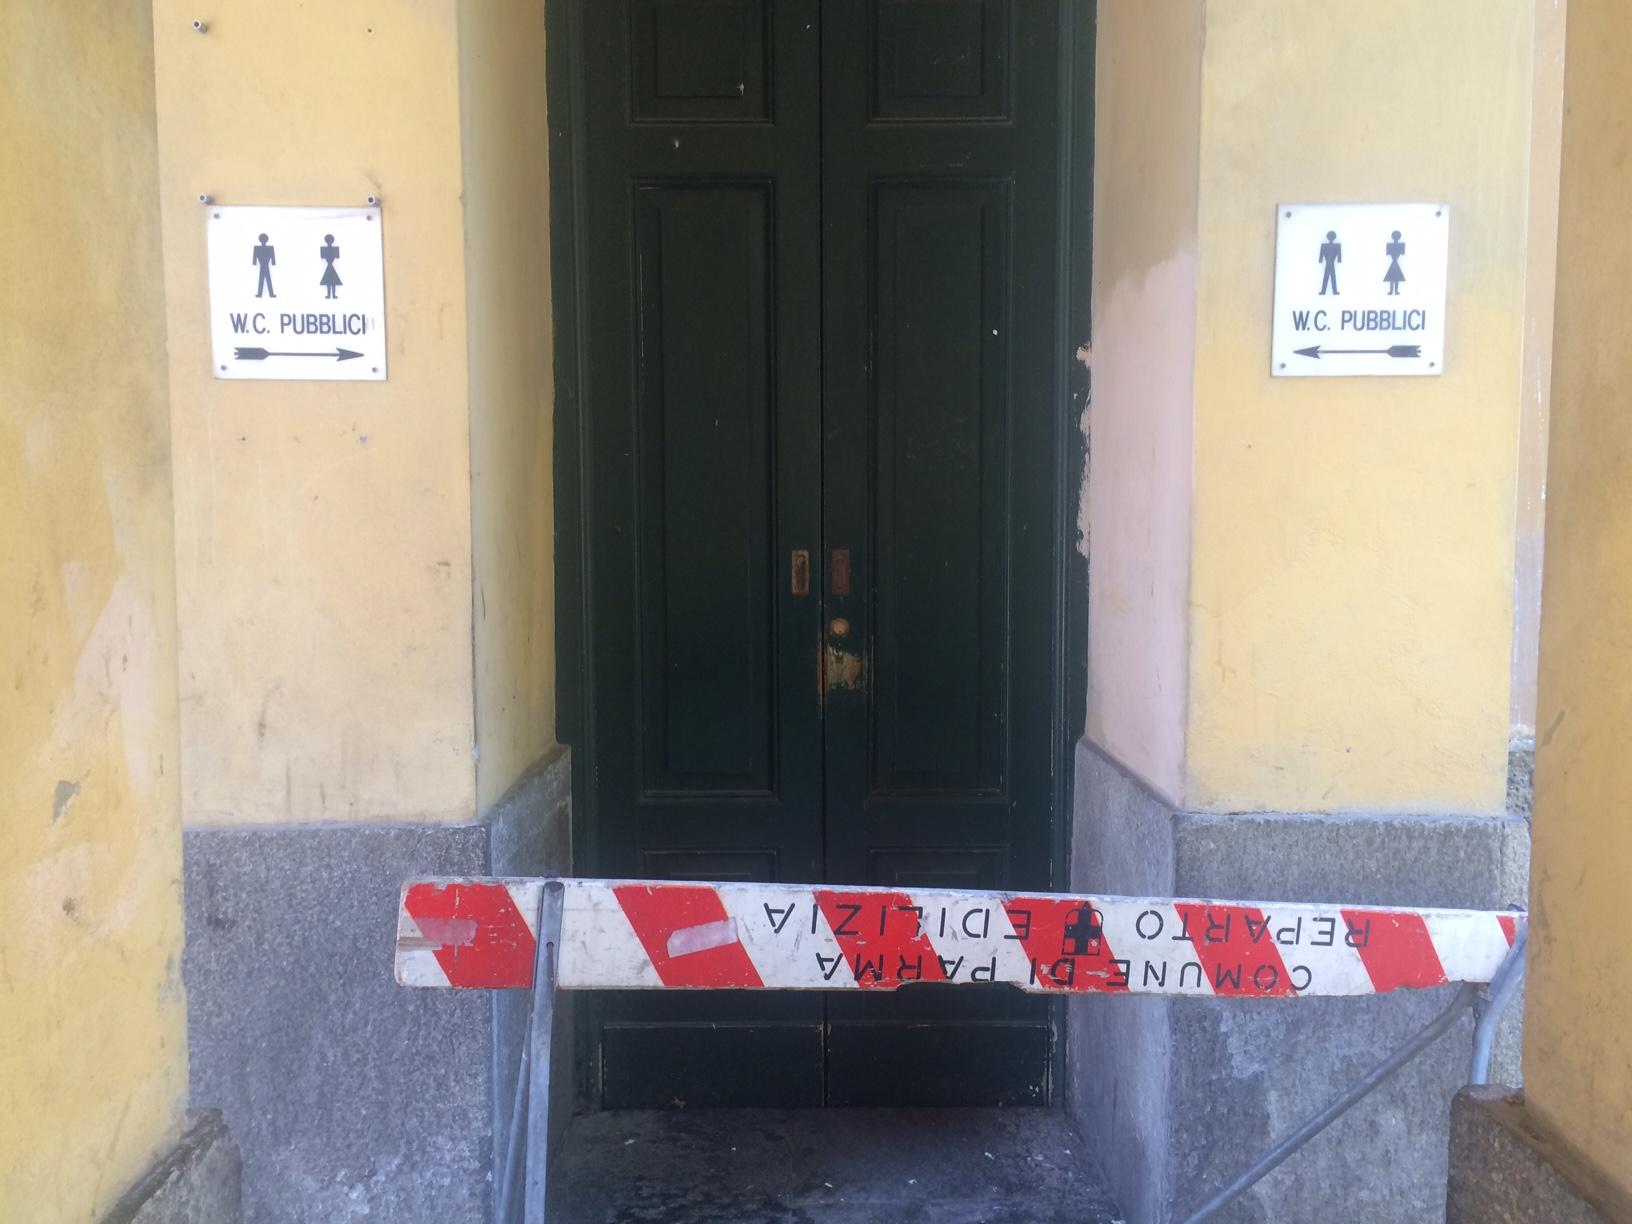 bagno pubblico - ParmaPress24